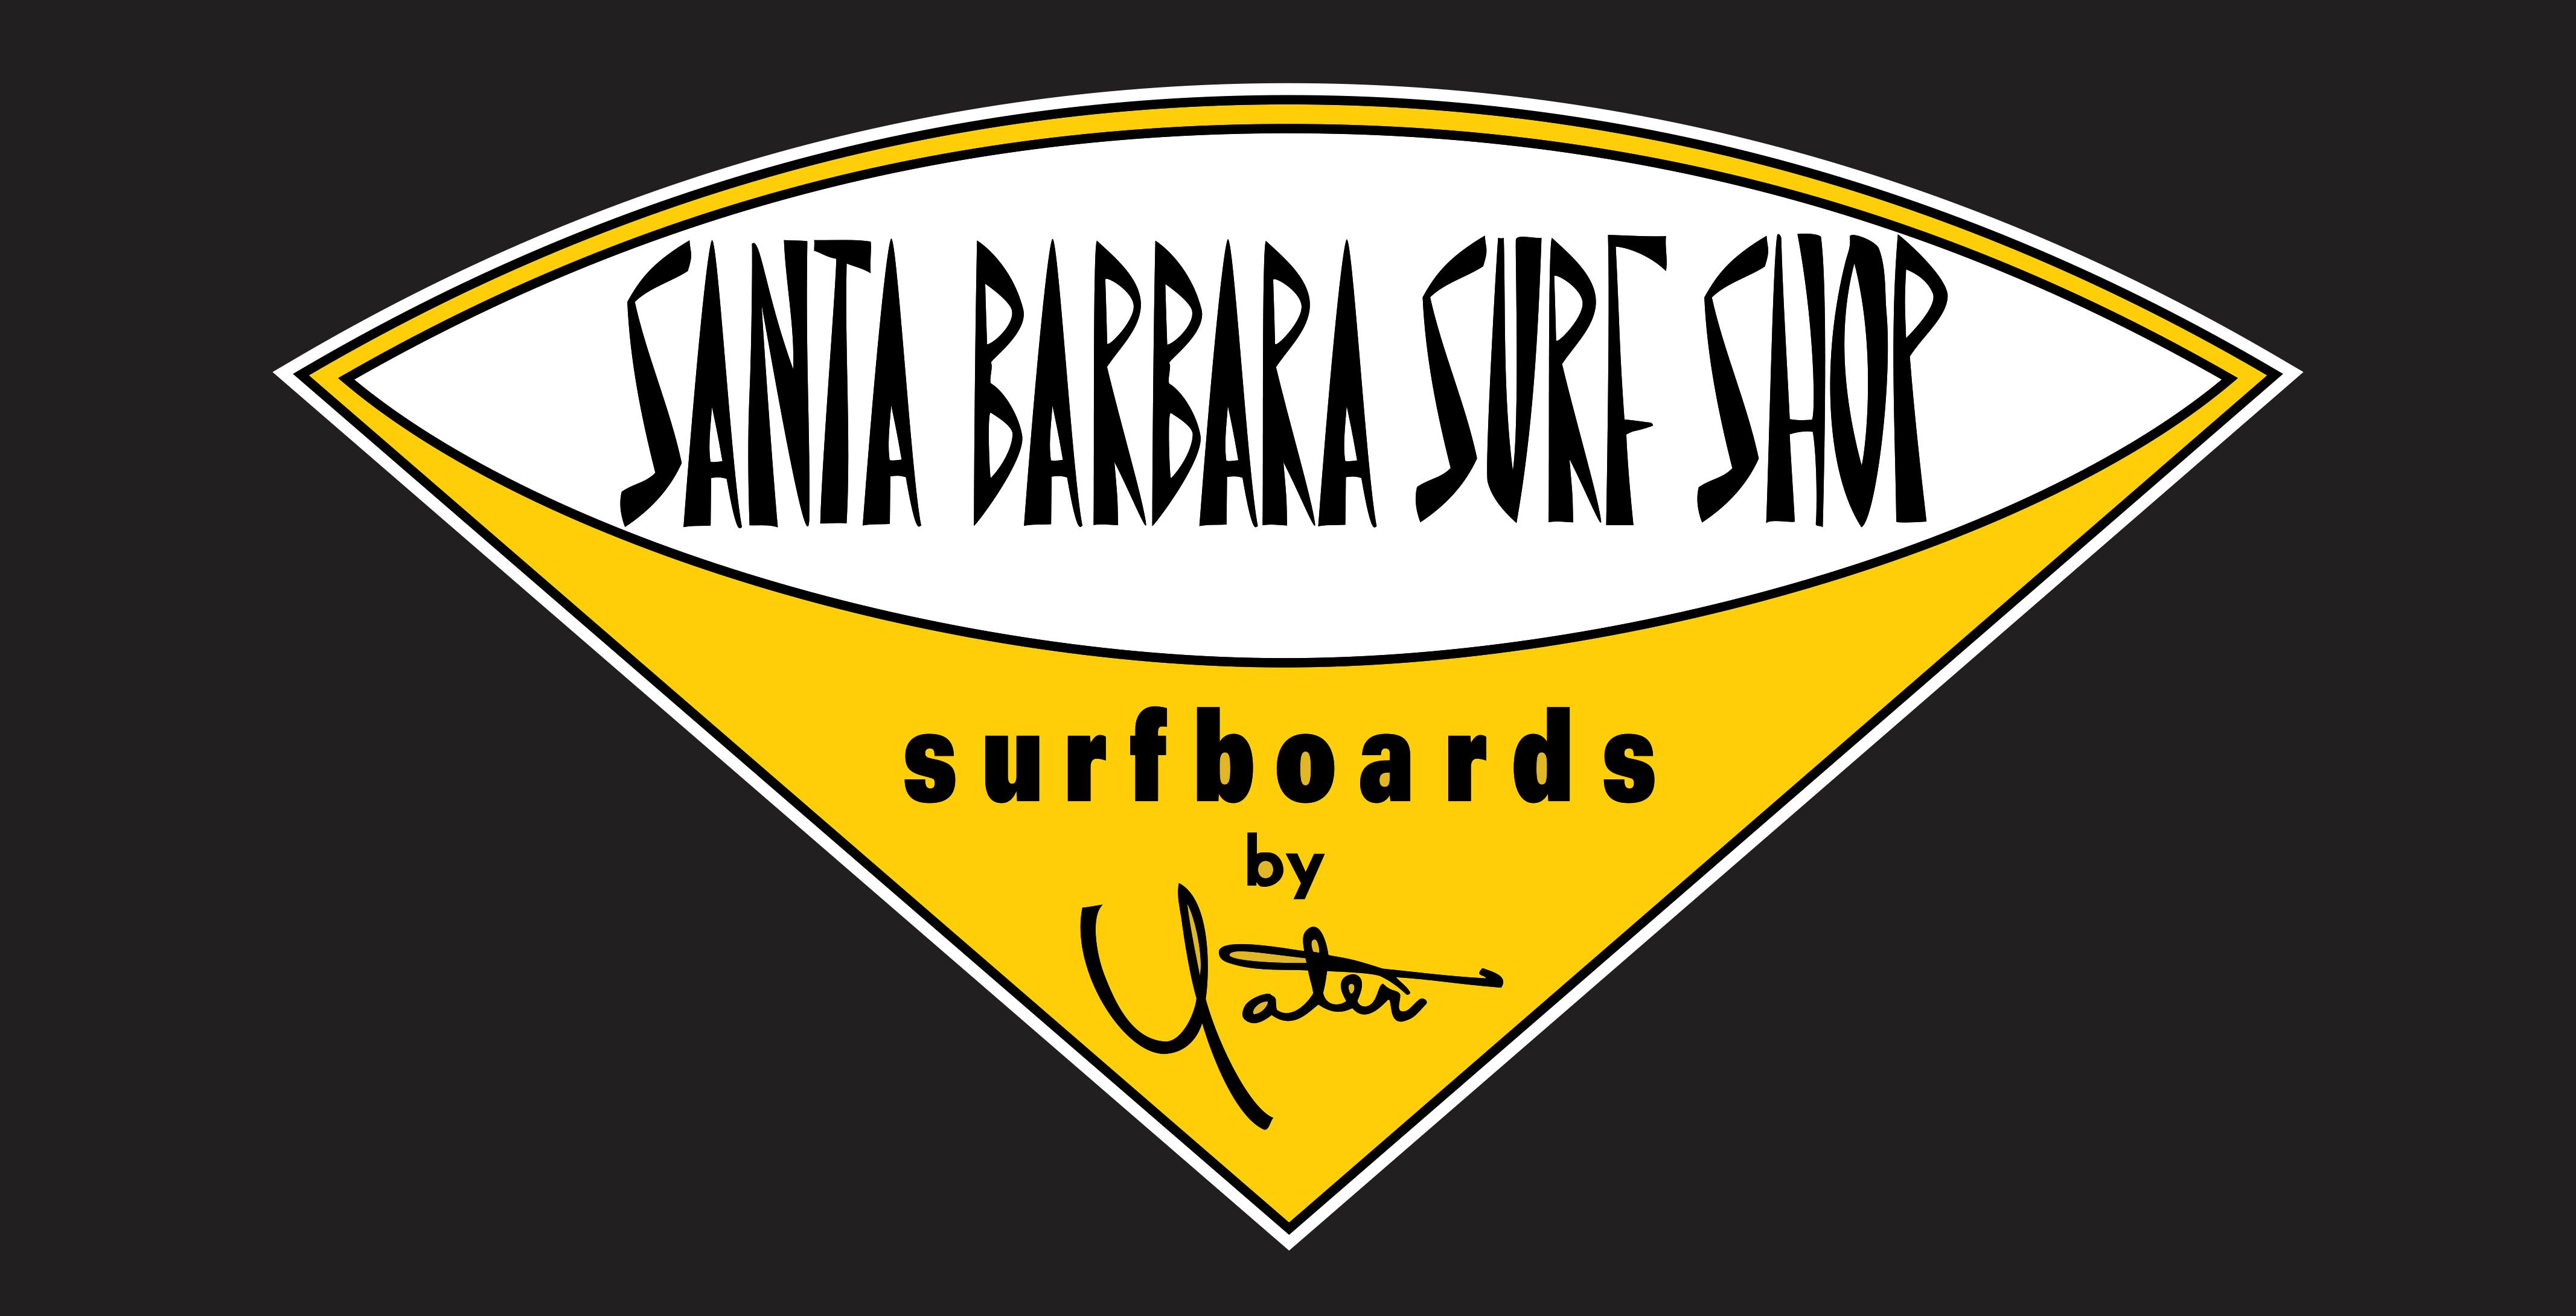 00422-SantaBarbara-SurfShop_34x70_V2